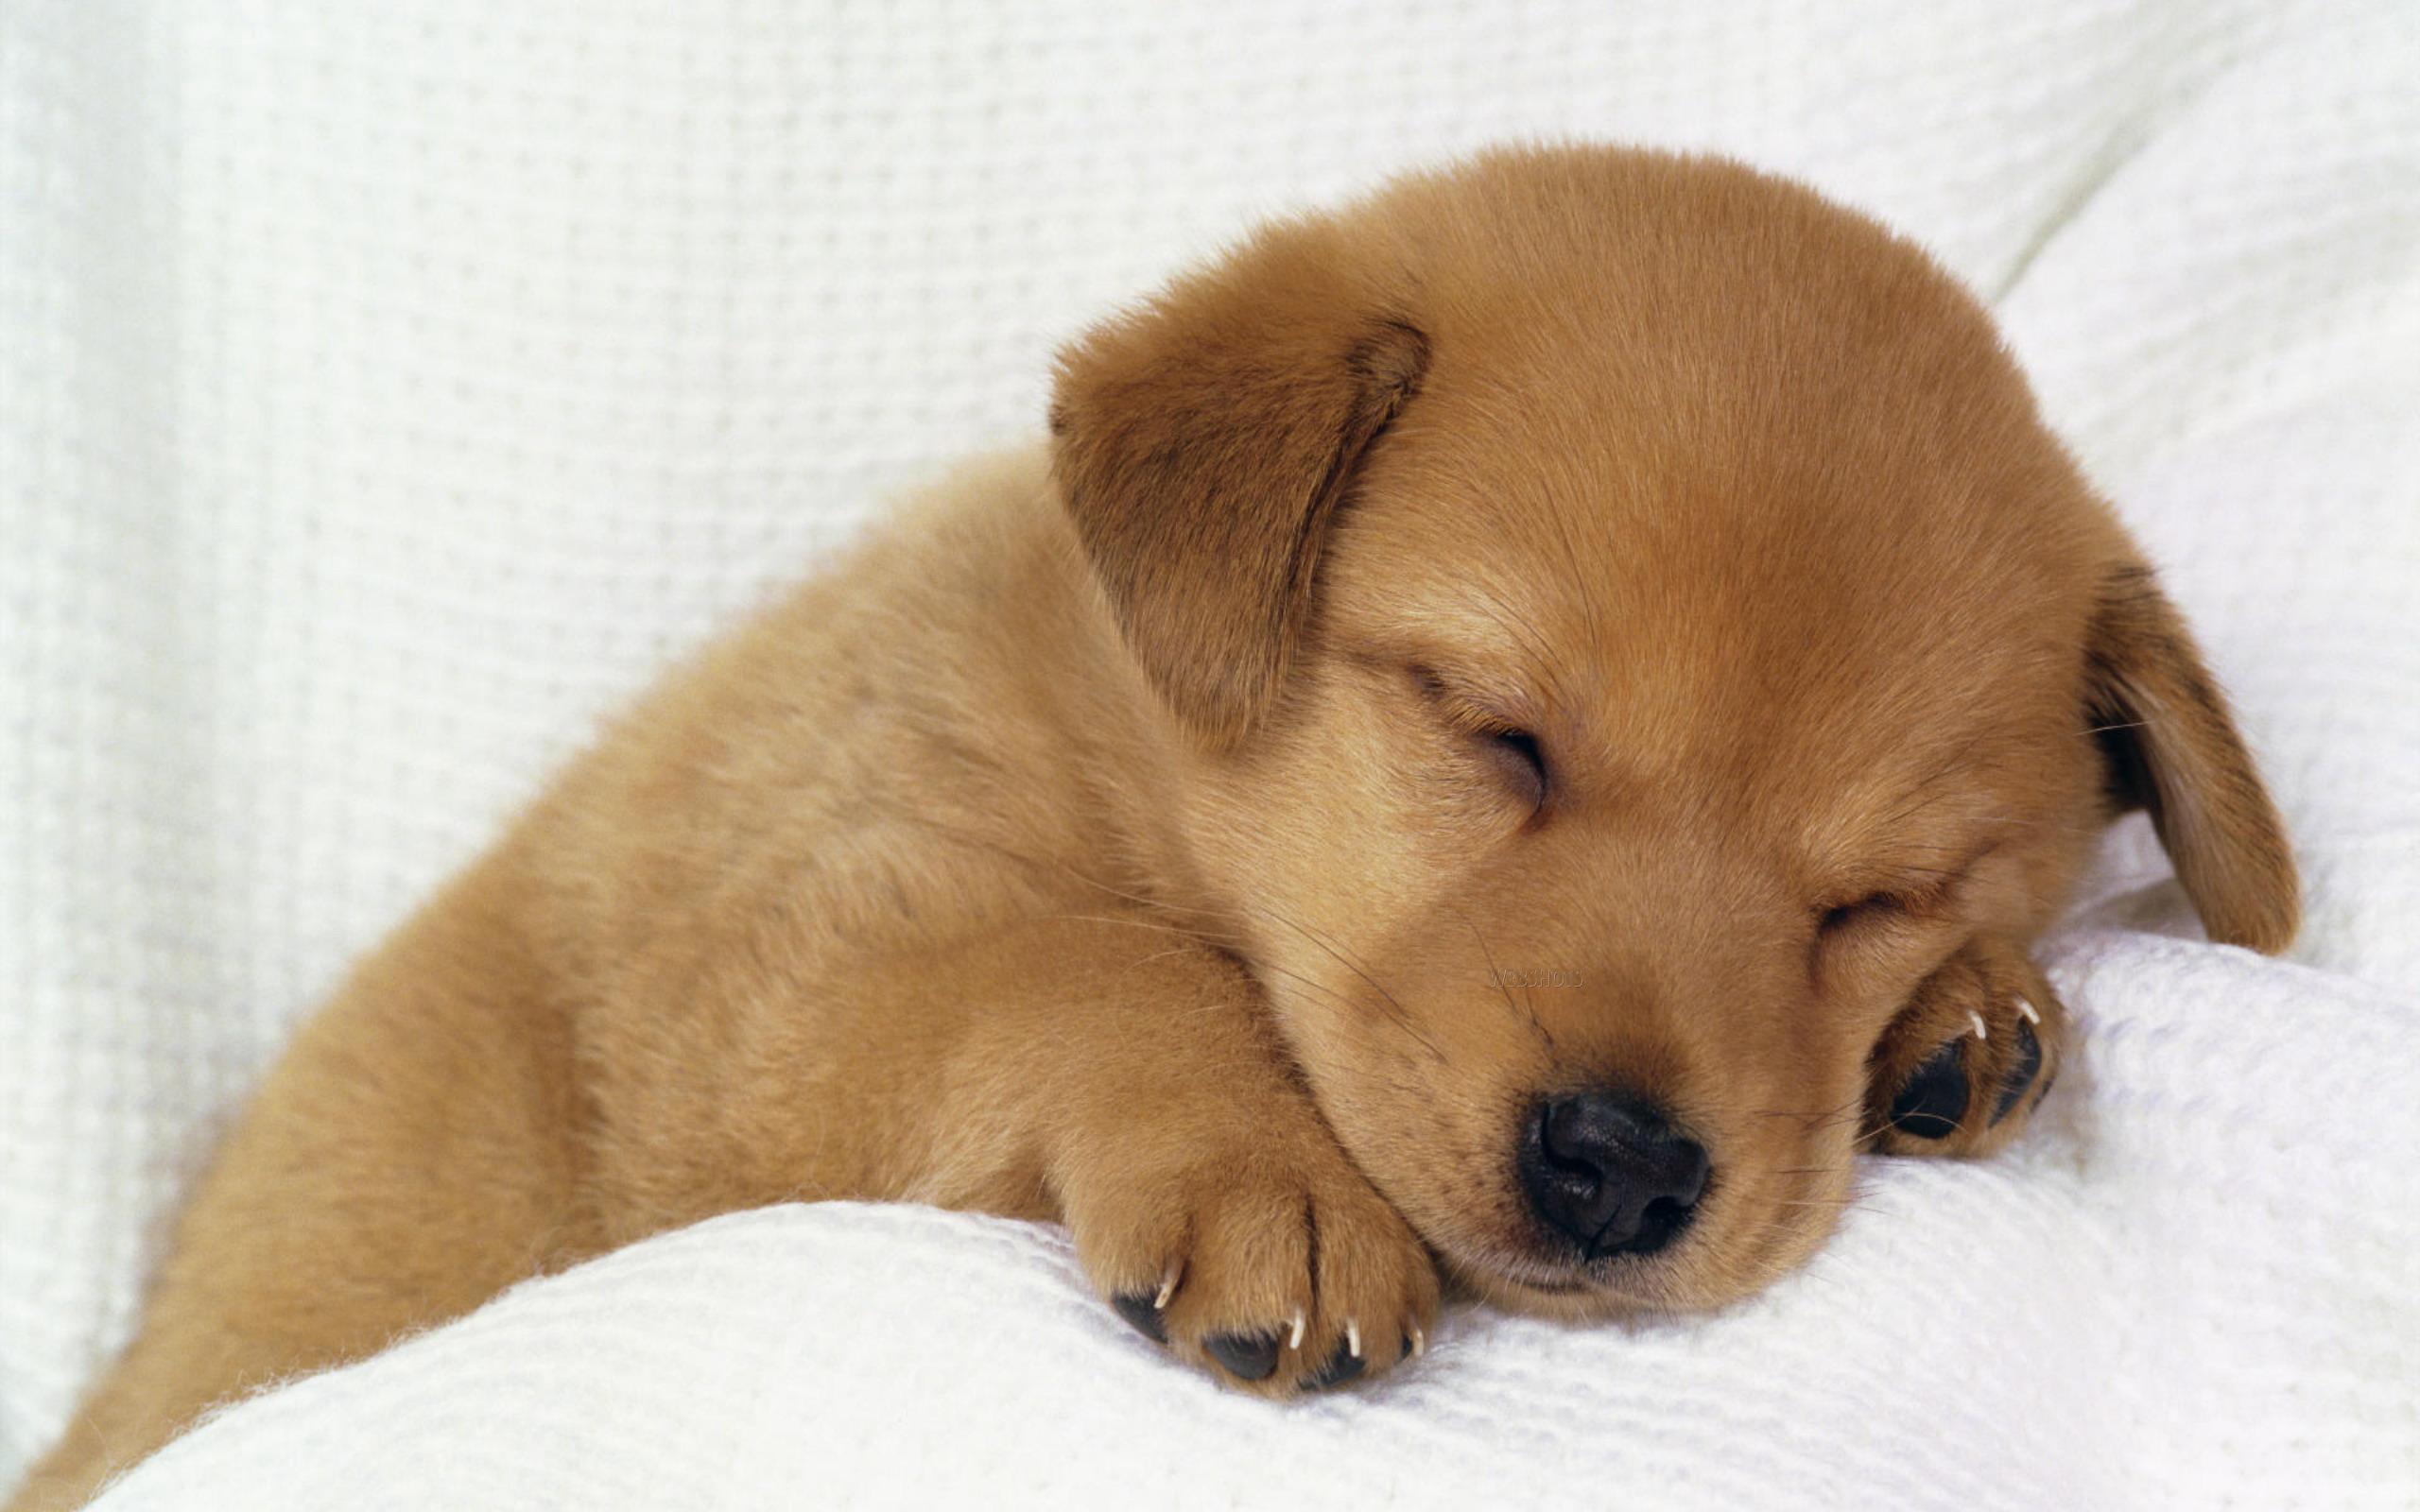 sleeping dog image wallpaper Wallpaper